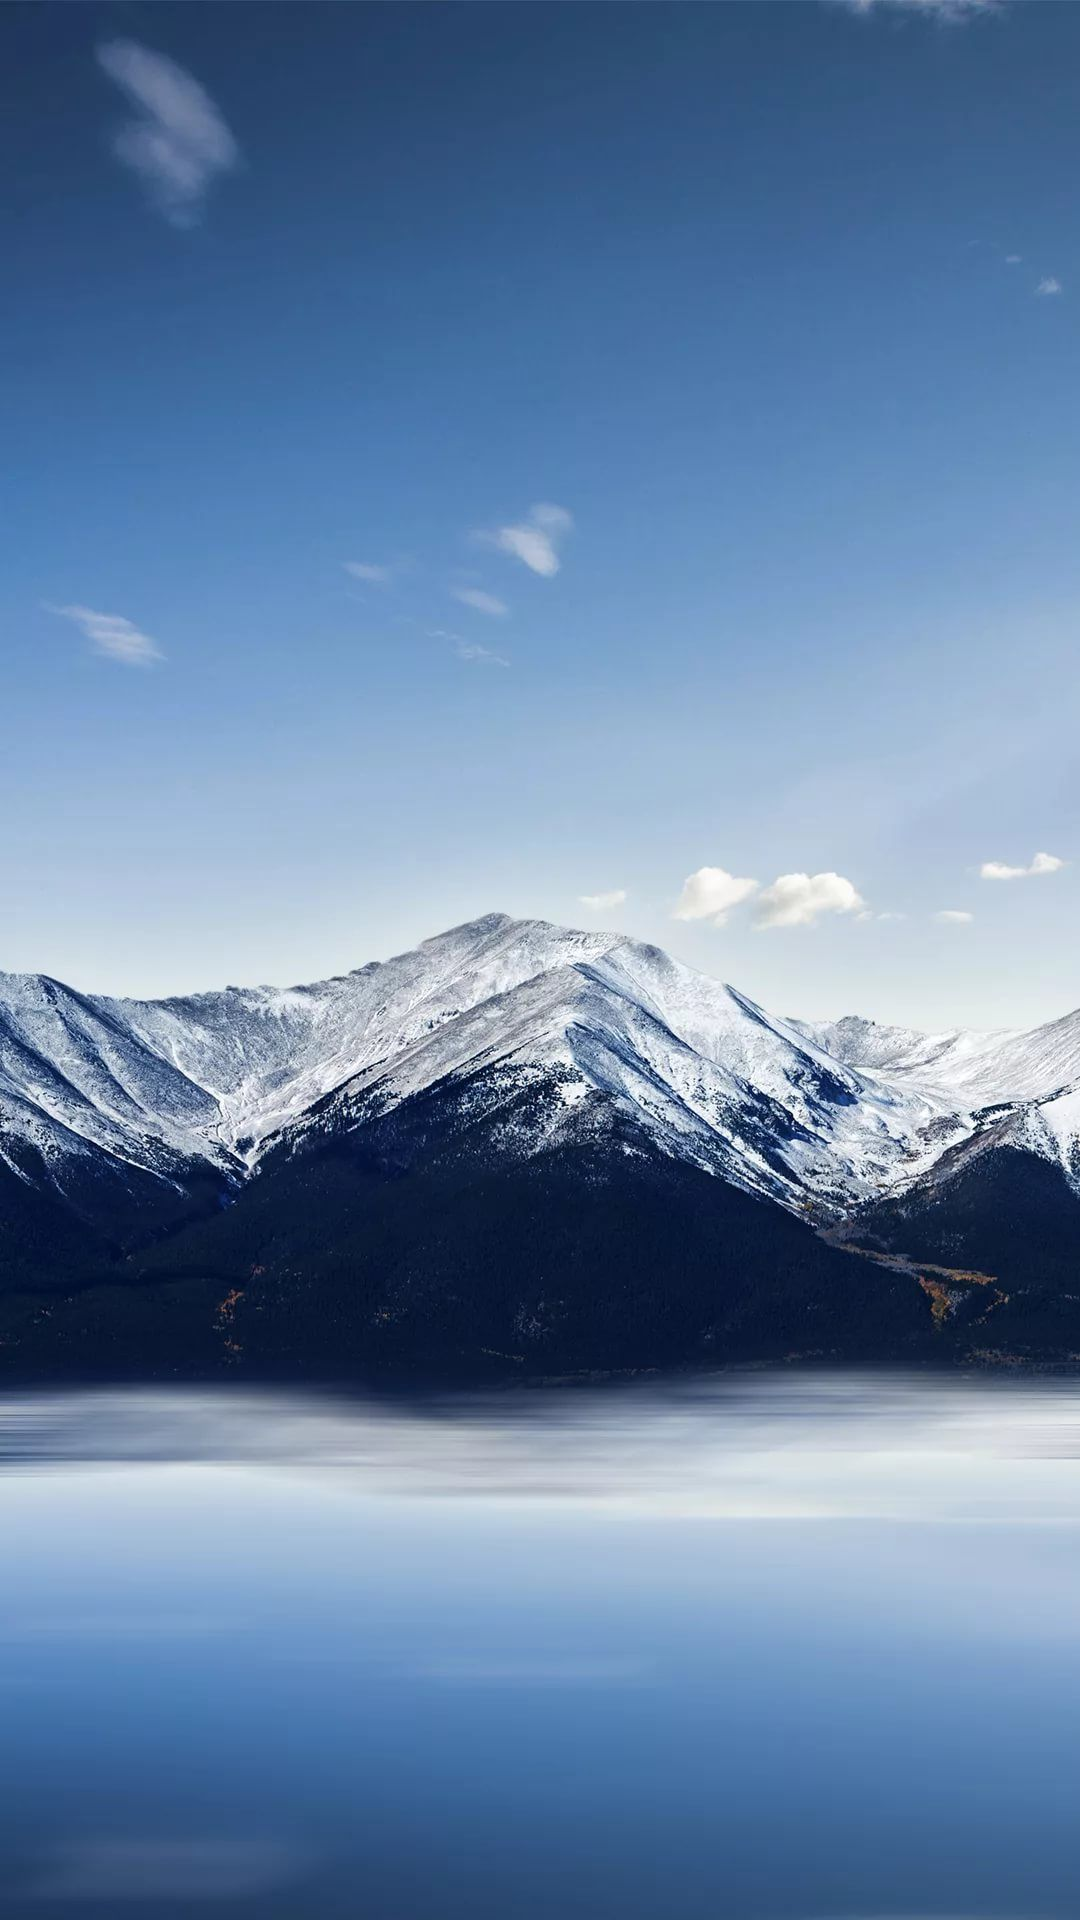 Mountain Wallpaper iPhone 7